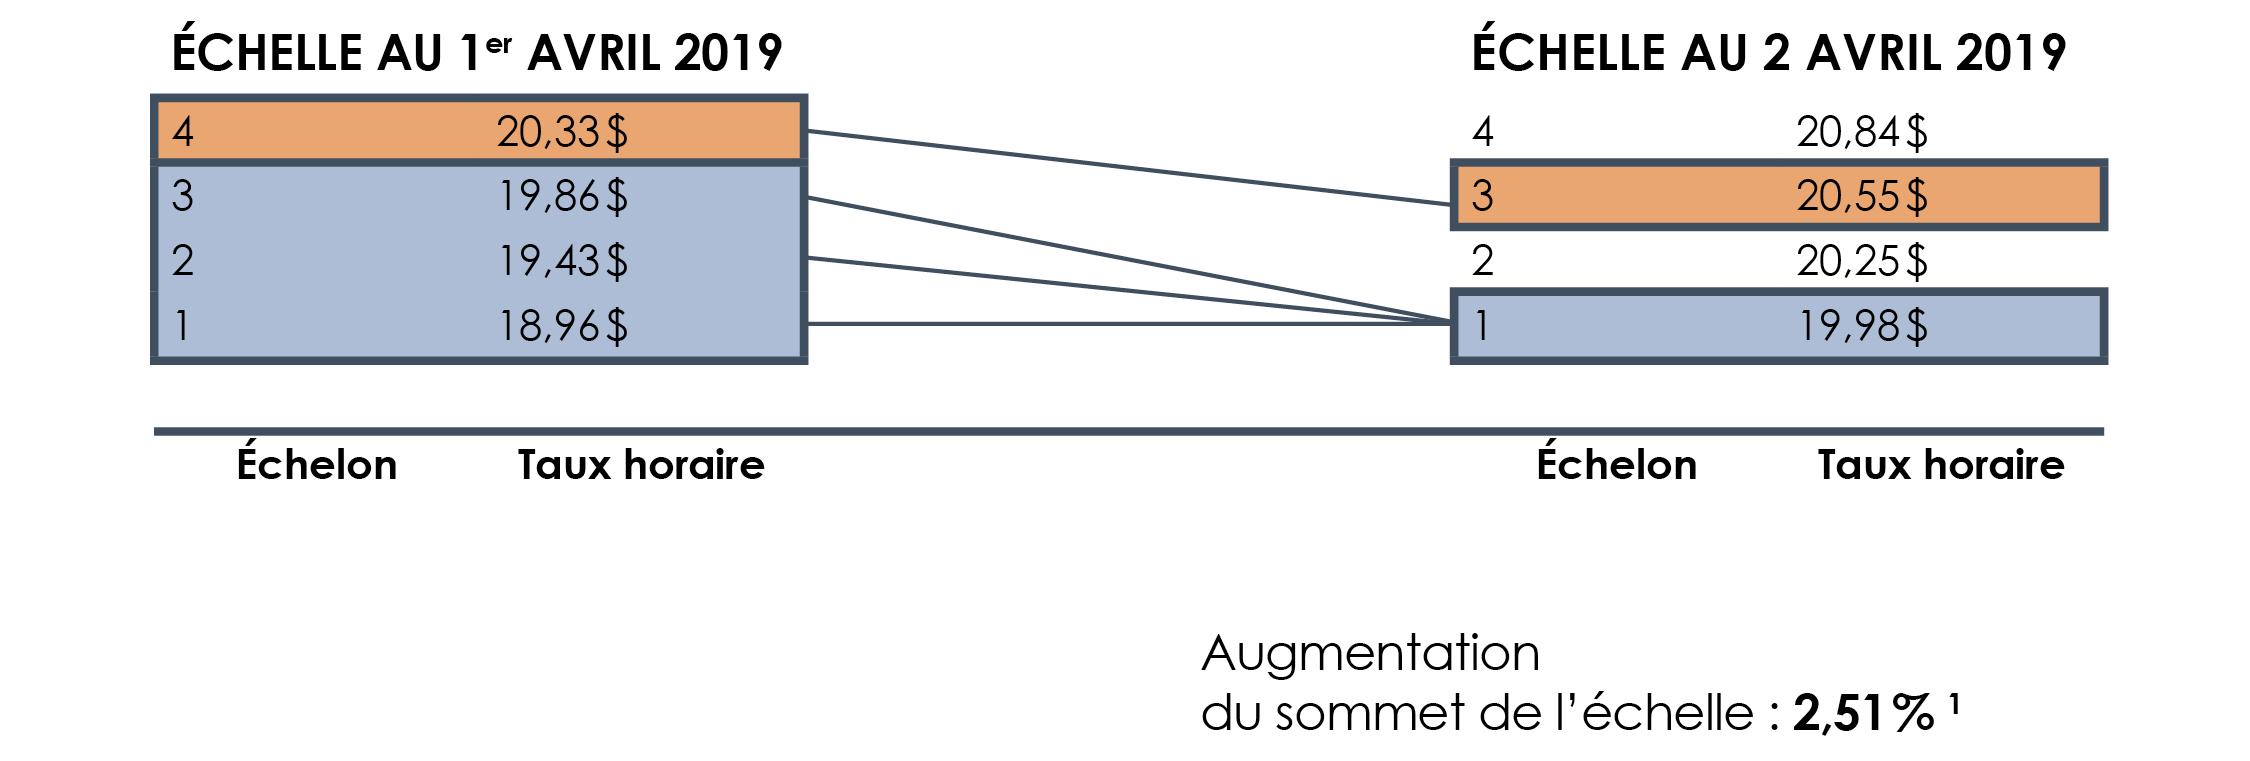 Simulateur De La Relativite Salariale Au 2 Avril 2019